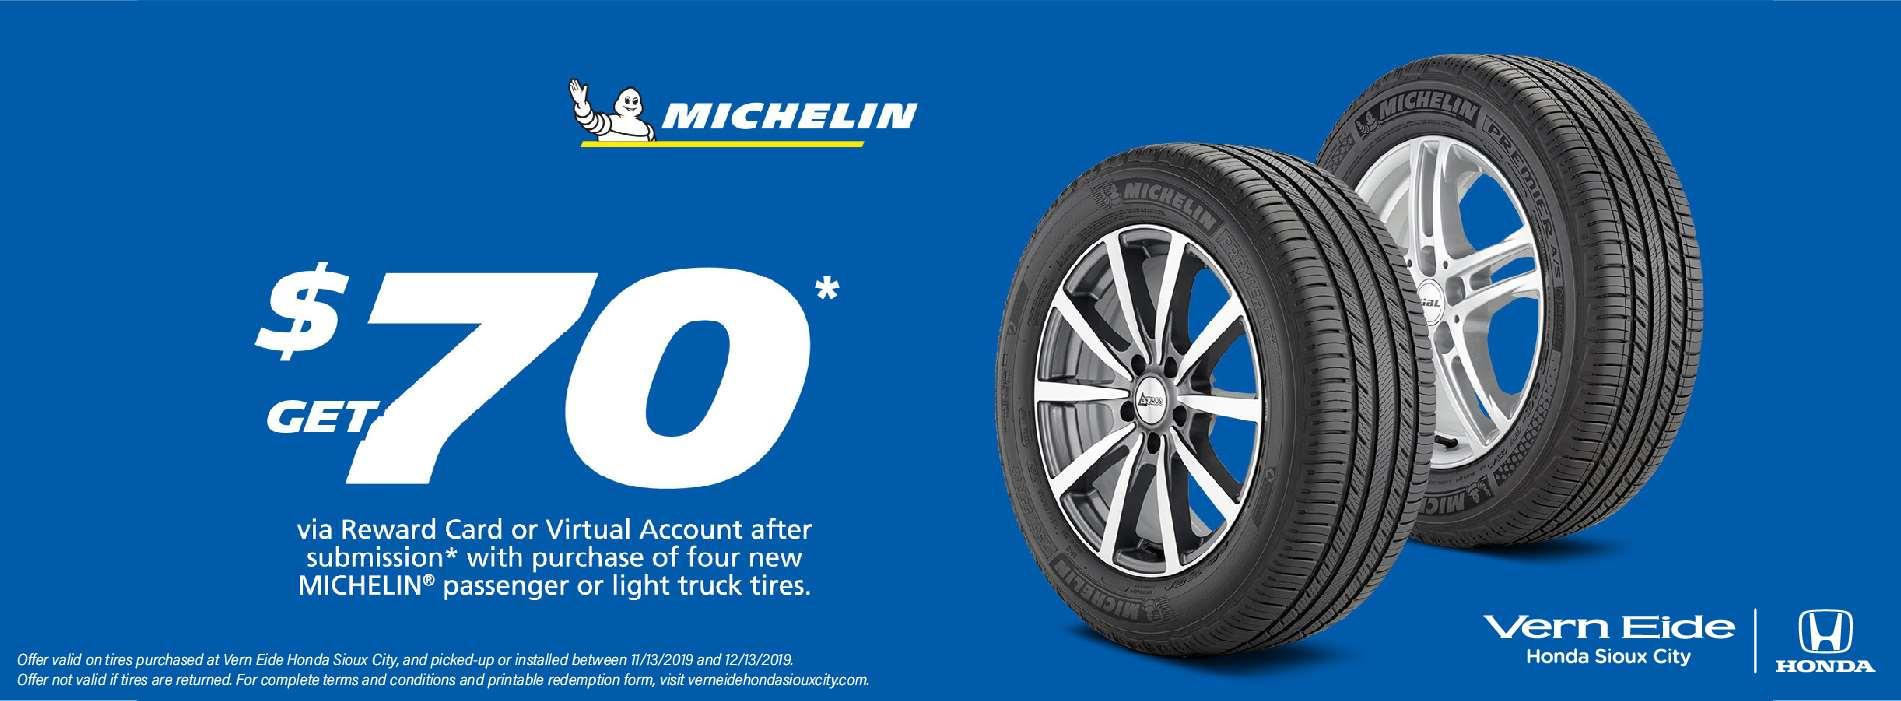 VESCH - Michelin Tires - Regular Banner - November 2019